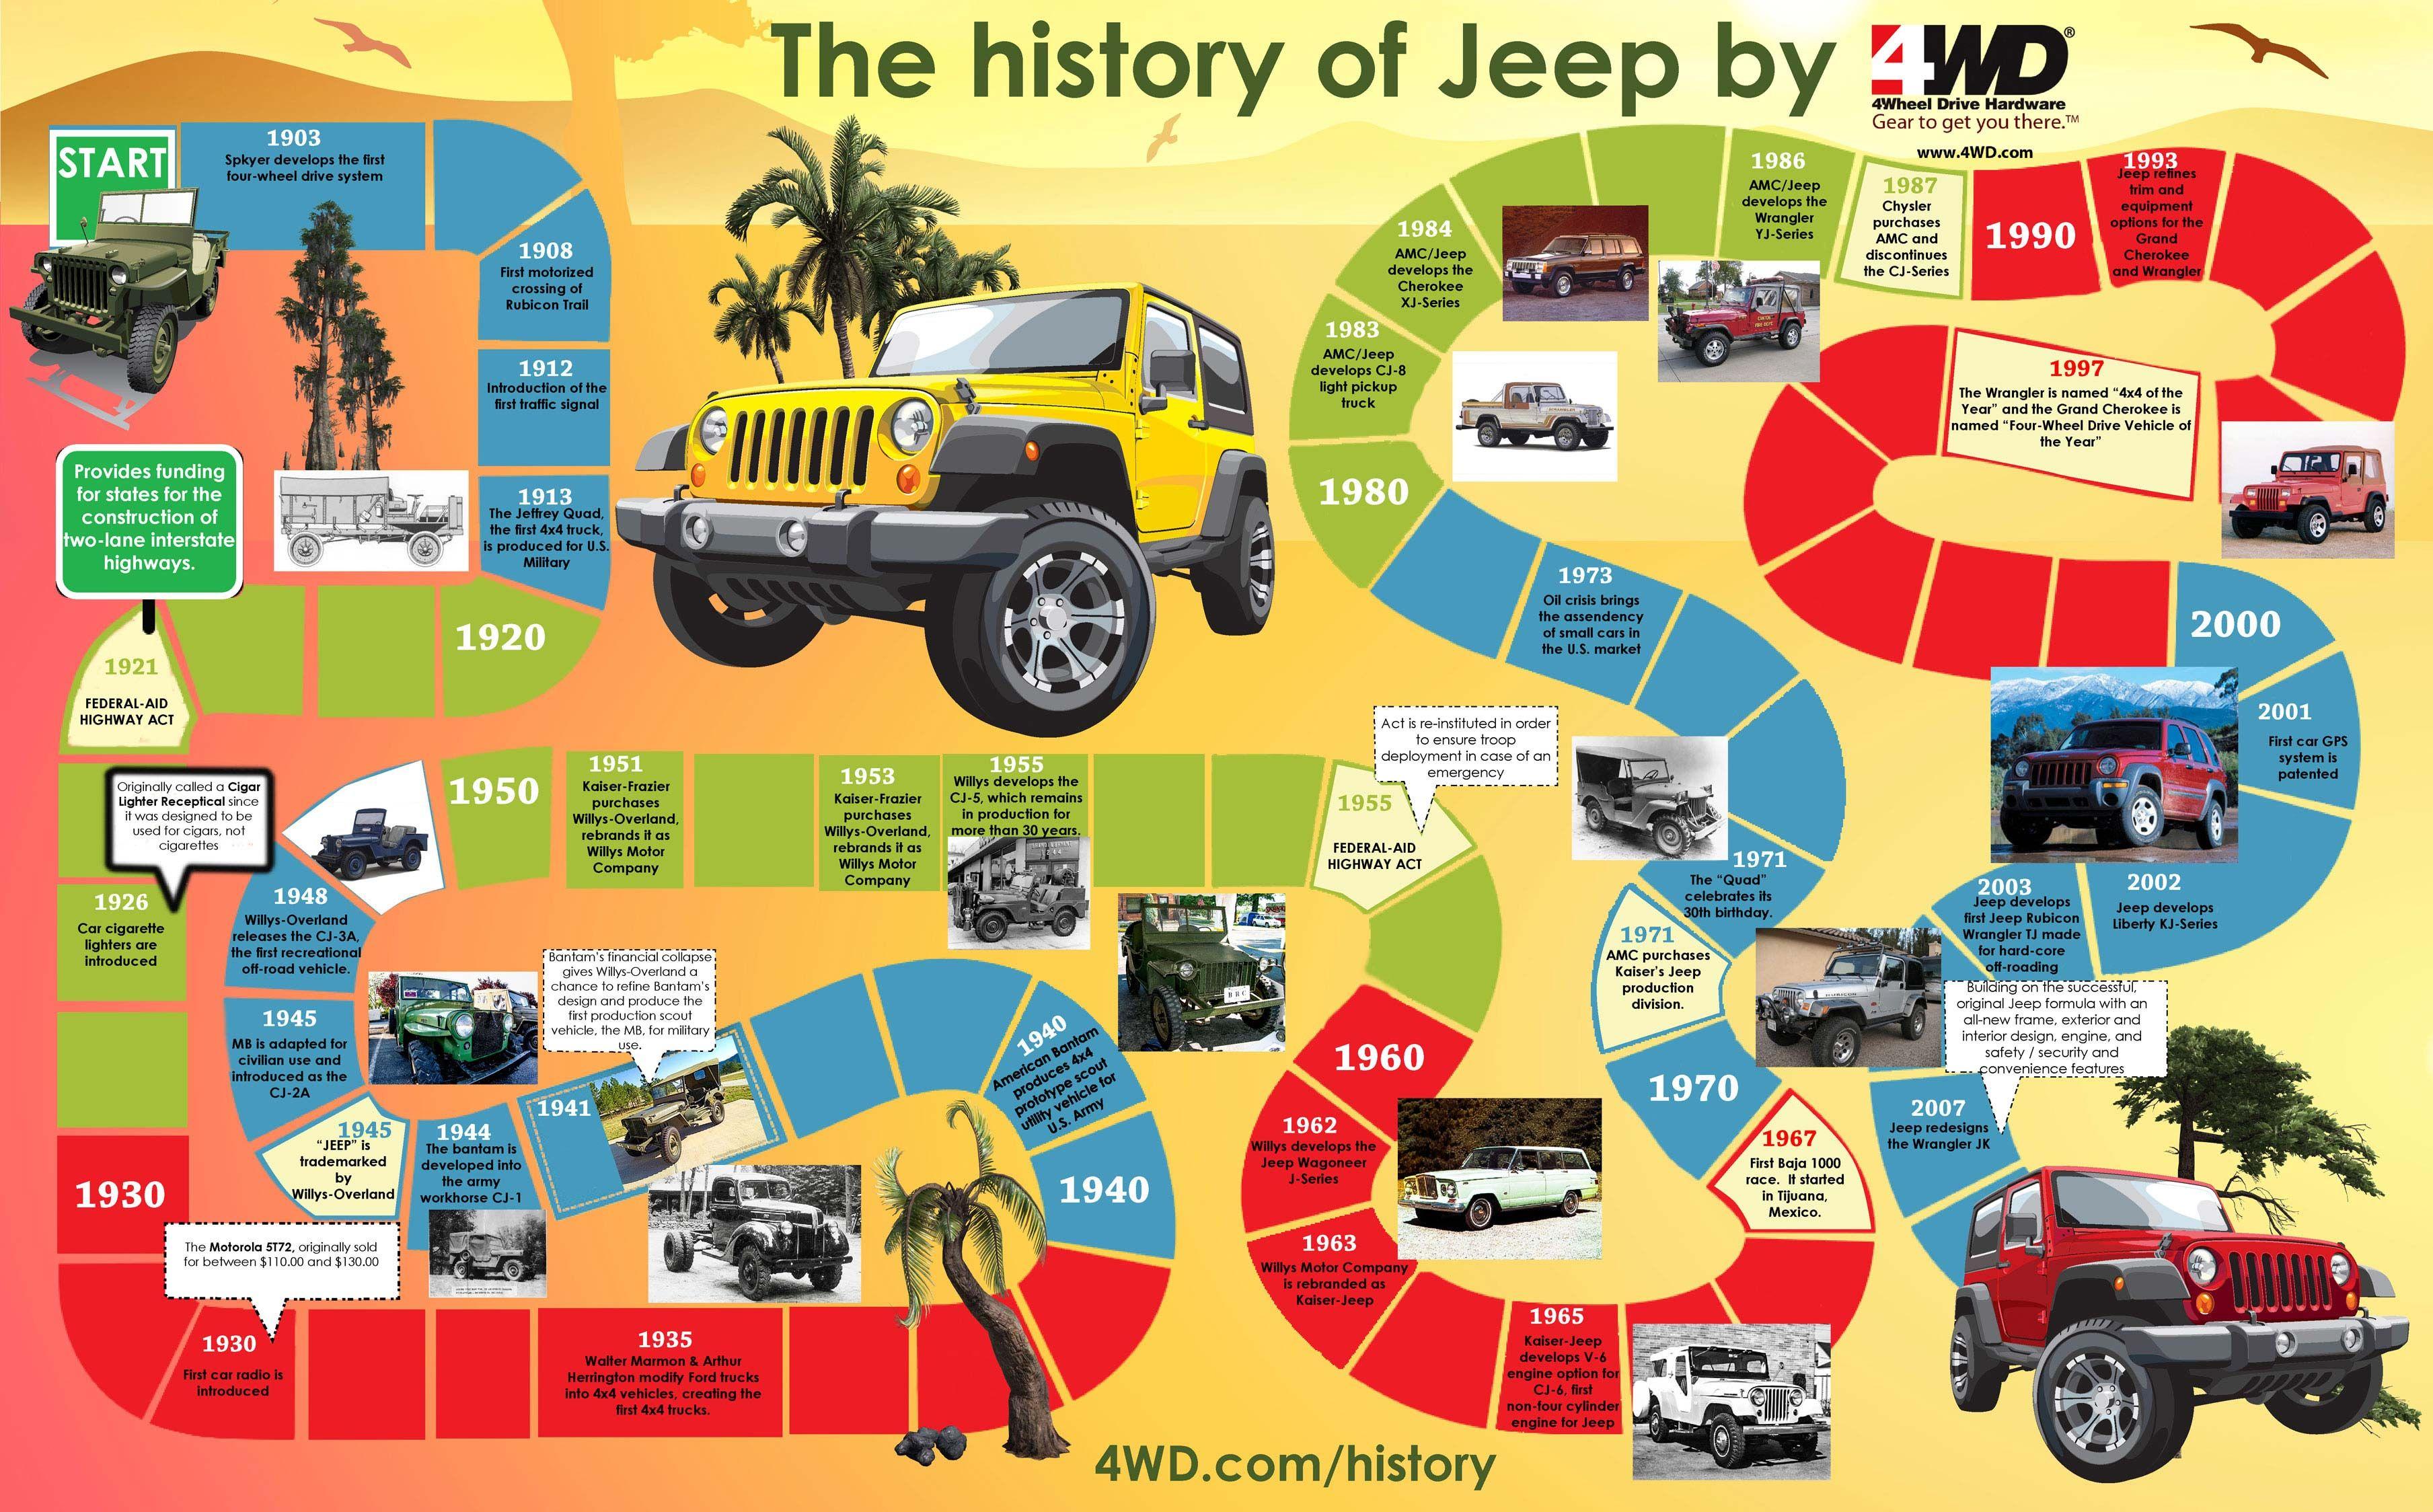 Jeep History Timeline iNFOGRAPHiCs MANiA Jeeps